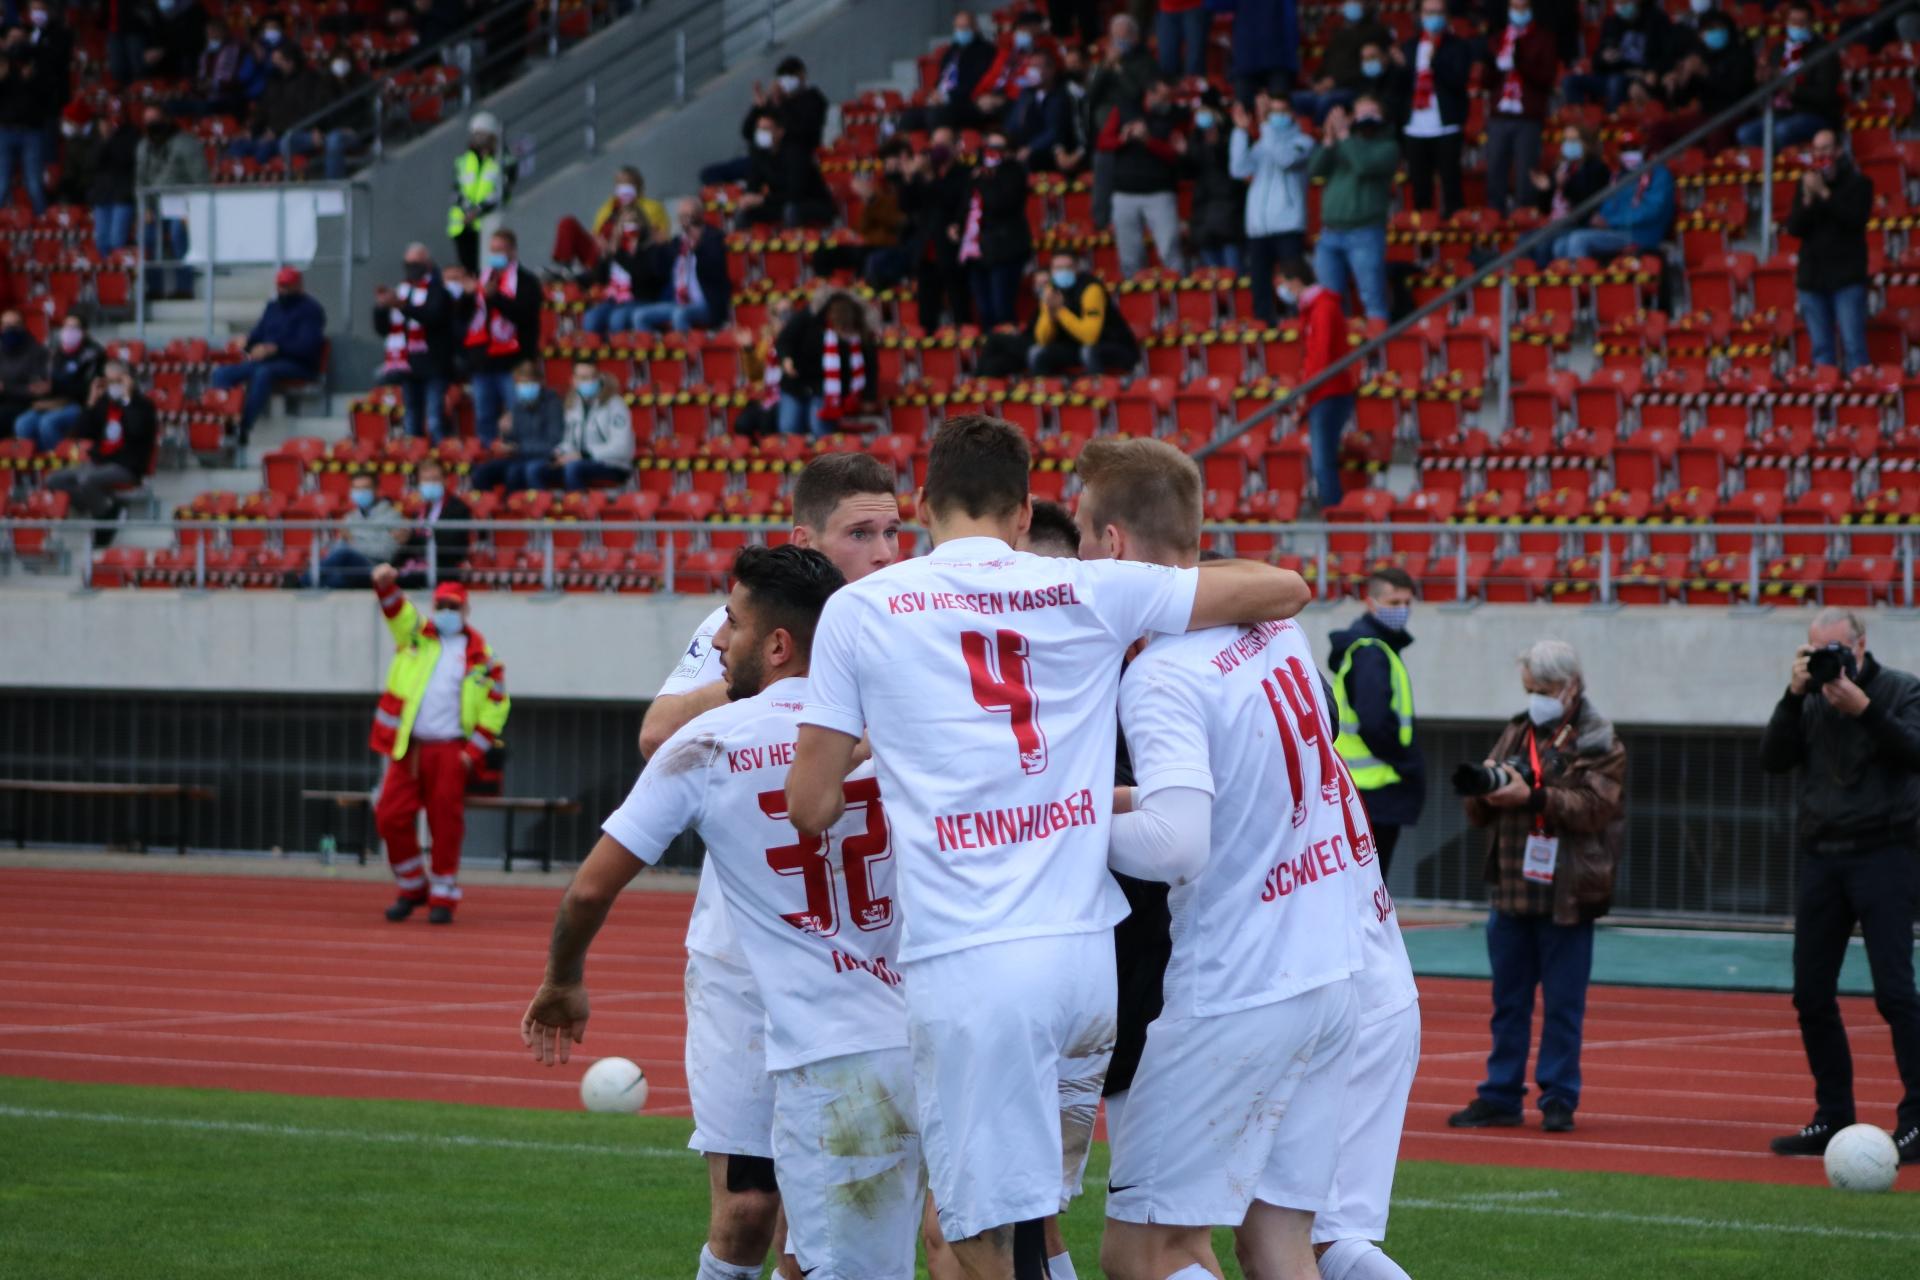 Regionalliga Südwest 2020/21, KSV Hessen Kassel, 1. FSV Mainz 05 II, Endstand 2:1, Jubel